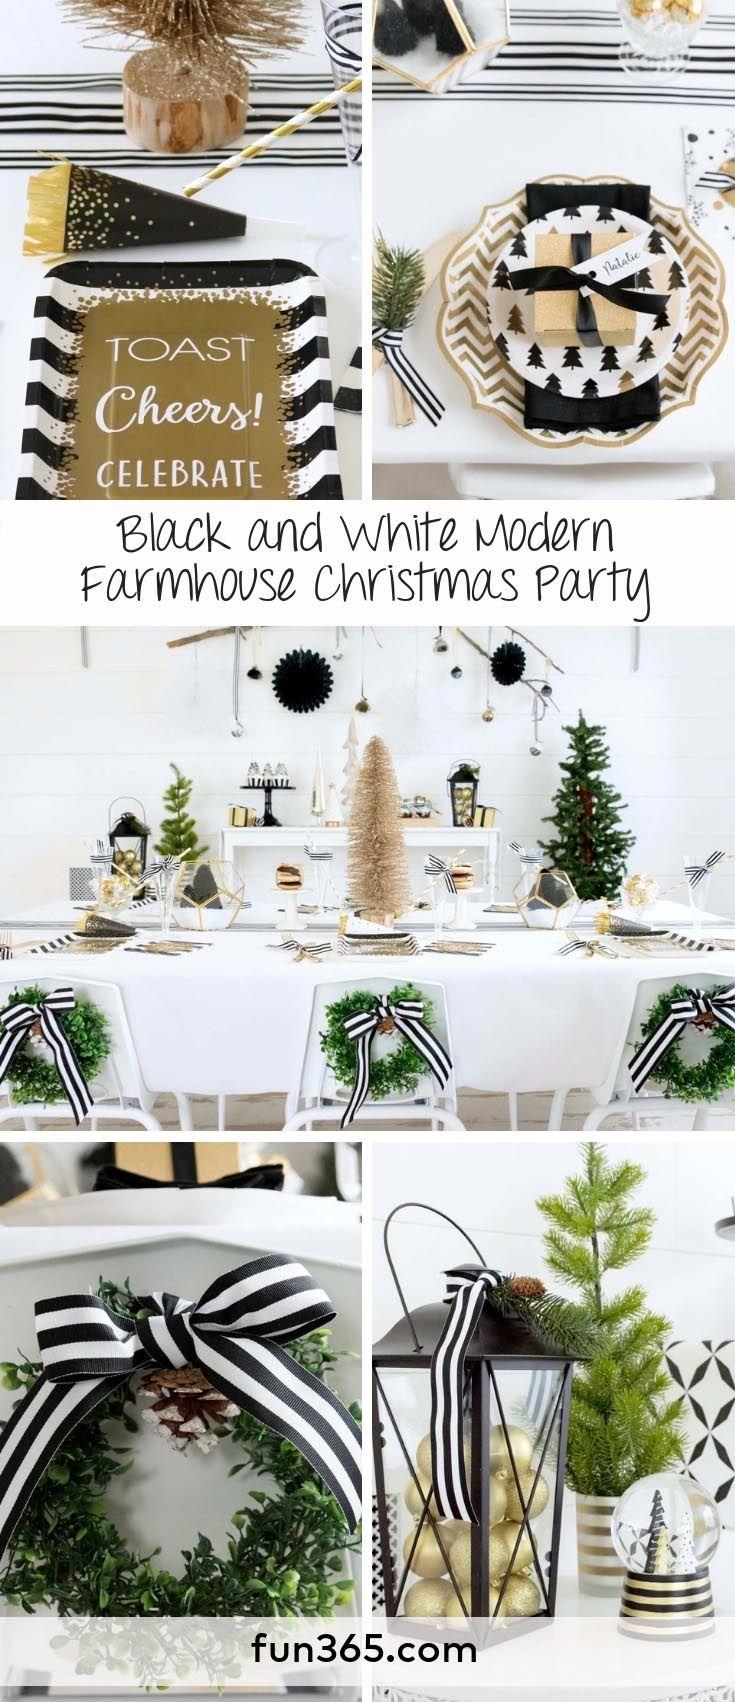 Fun365 Craft Party Wedding Classroom Ideas Inspiration Farmhouse Christmas Christmas Party Decorations Diy Christmas Party Decorations